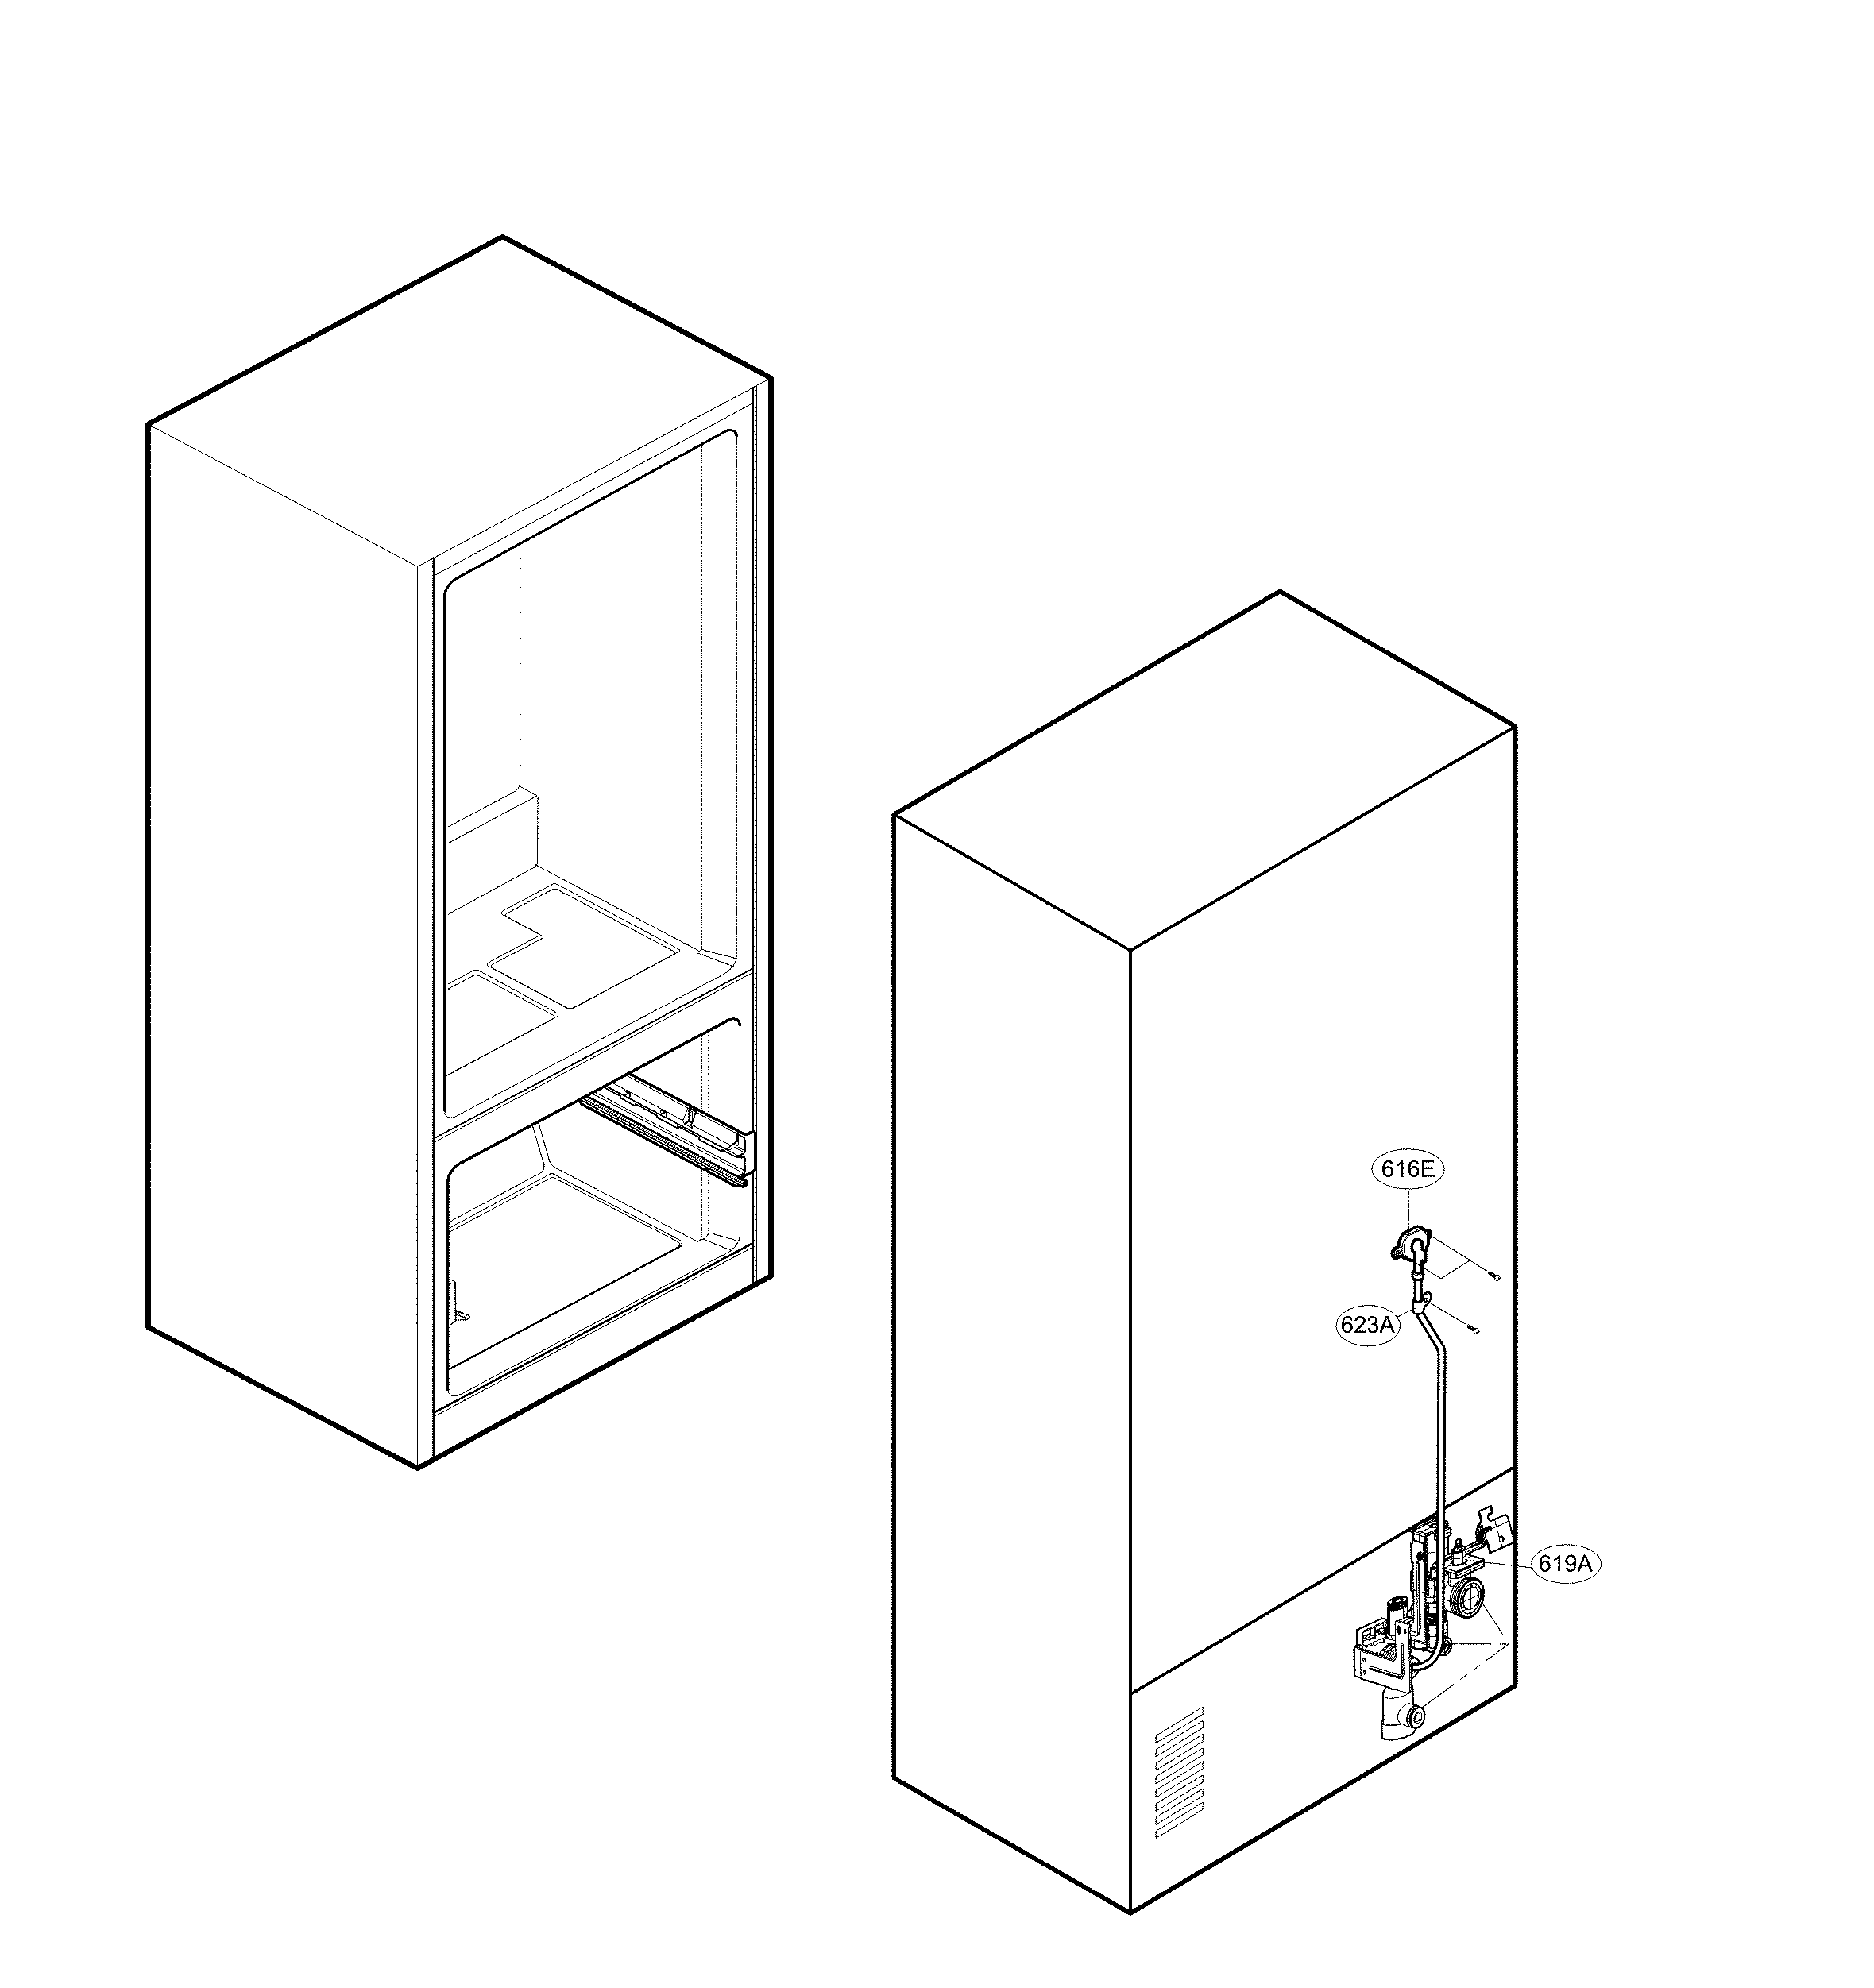 Lg  Refrigerator  Valve & water tube parts